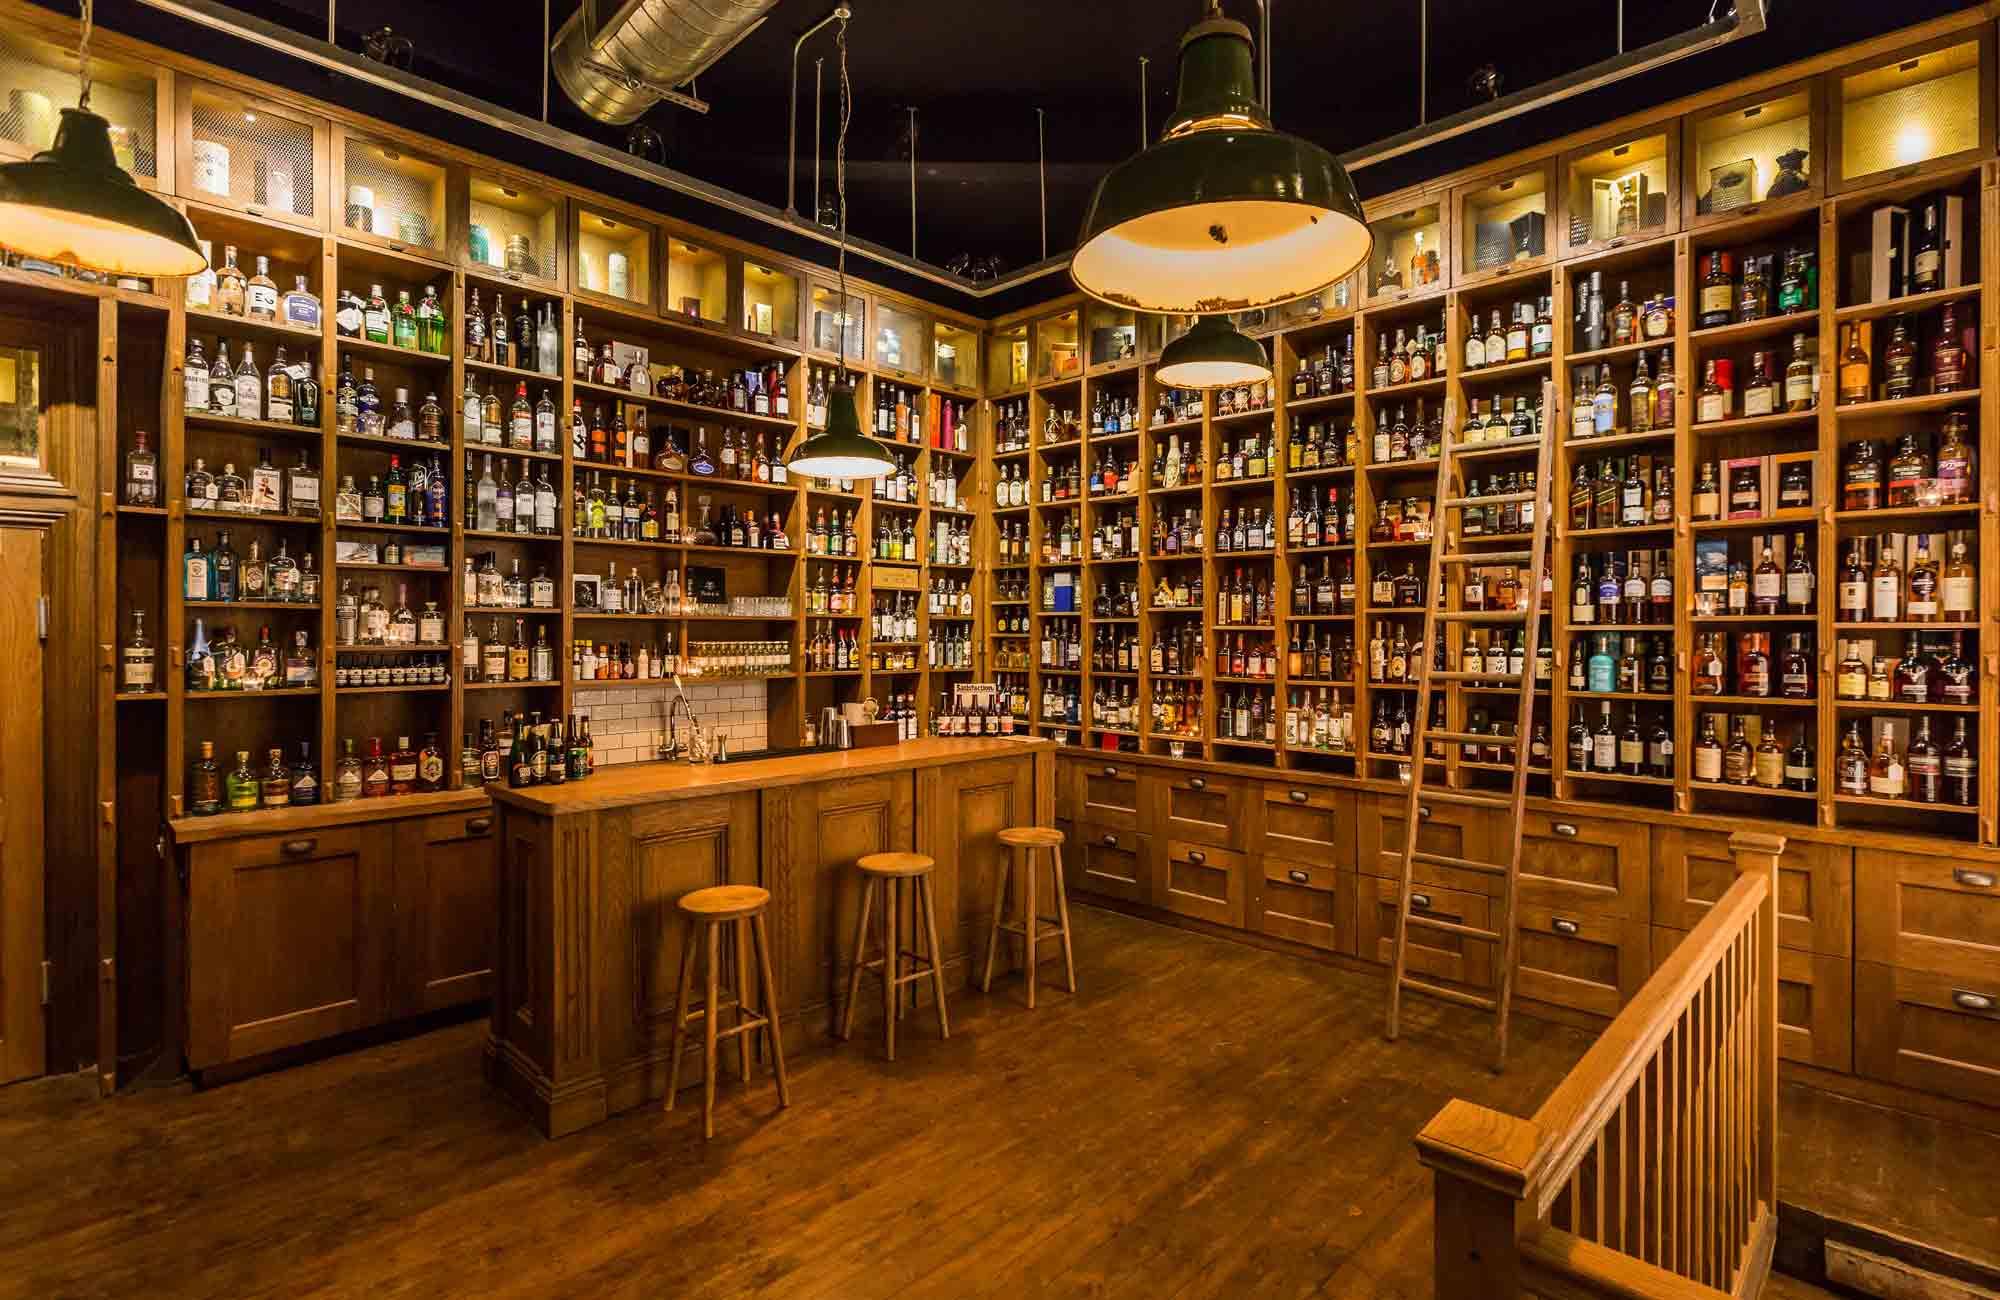 TT Liquor - Liquor Store, Off-licence, Shoreditch, East London